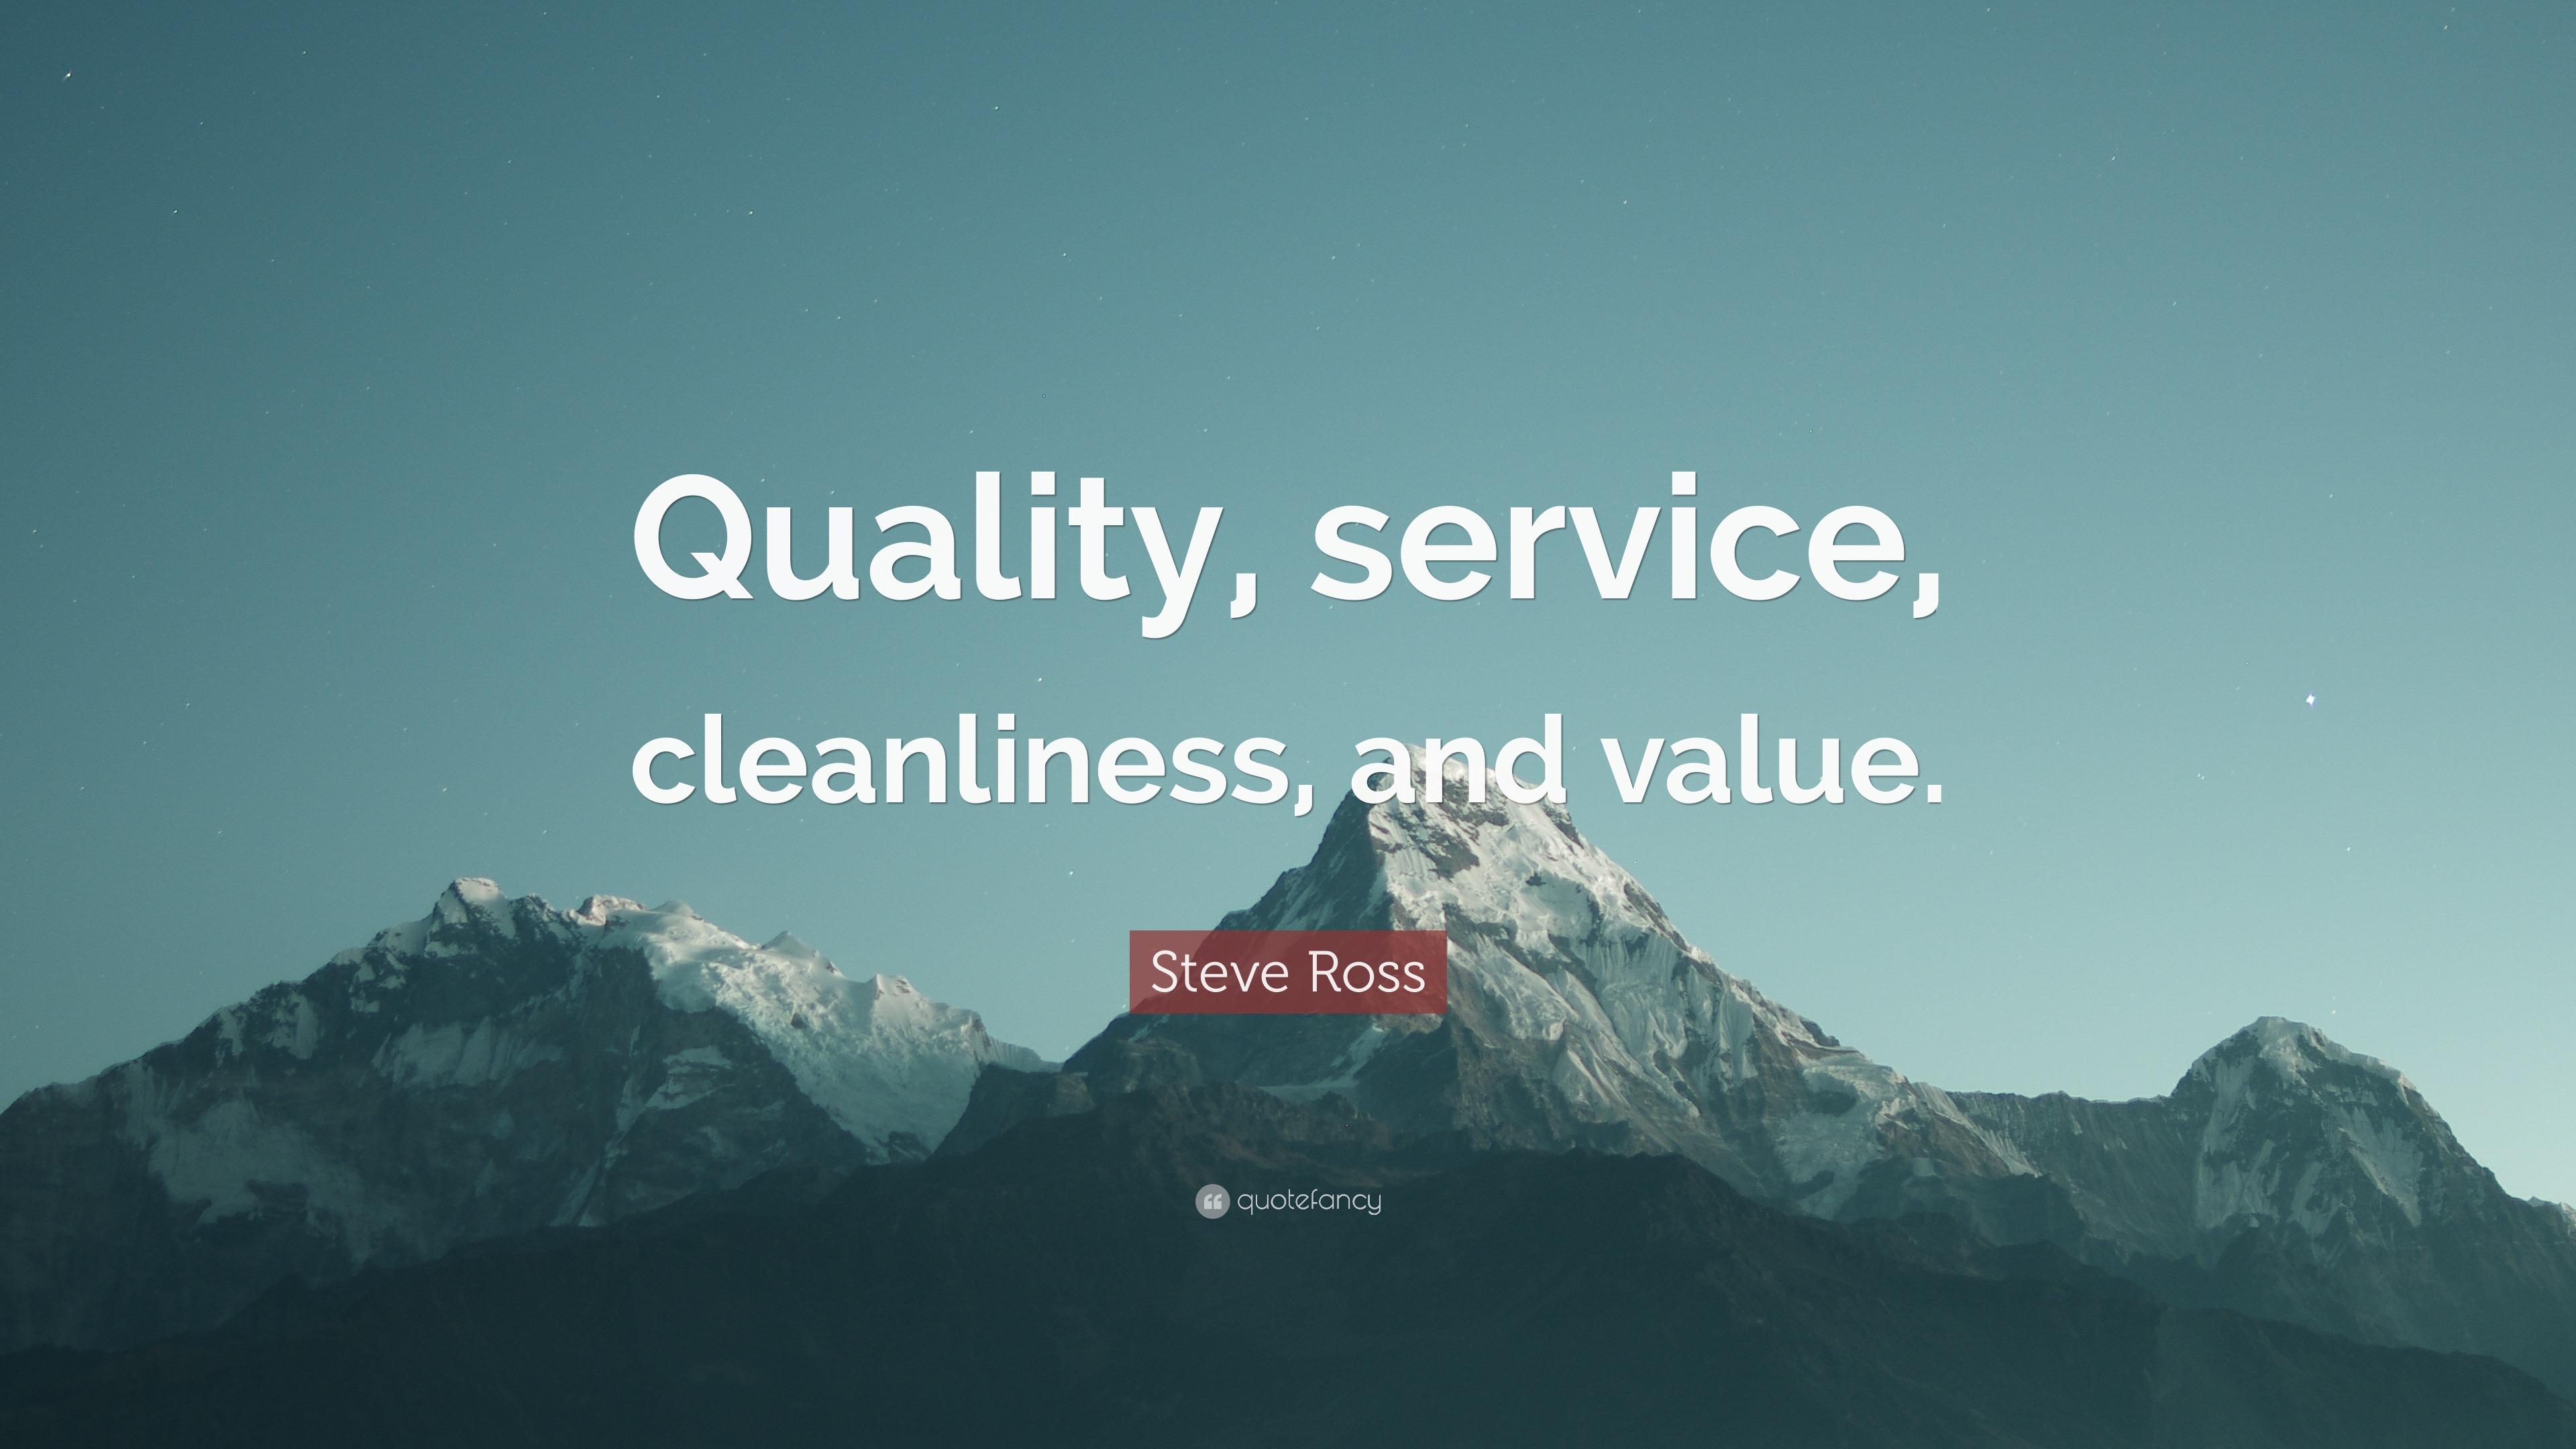 Steve Ross Quotes (9 wallpapers) - Quotefancy